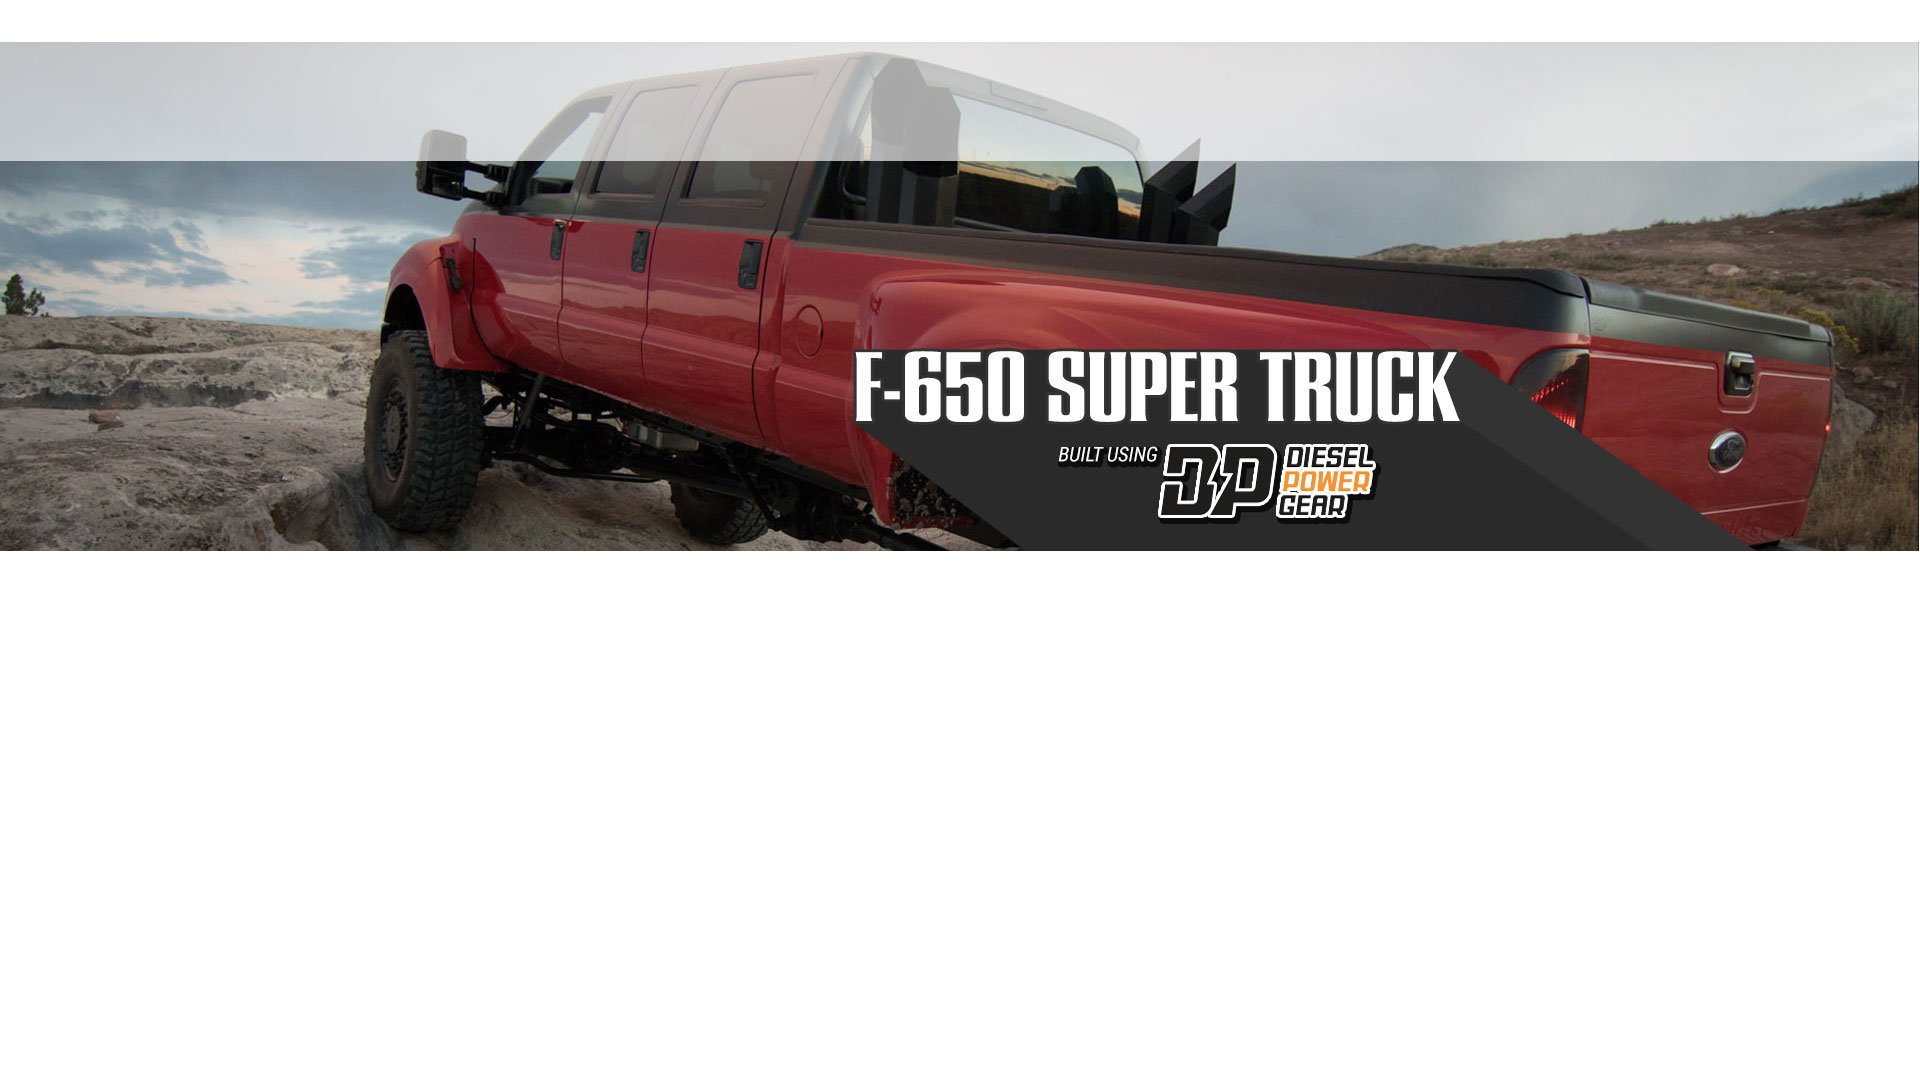 F-650 Super Truck